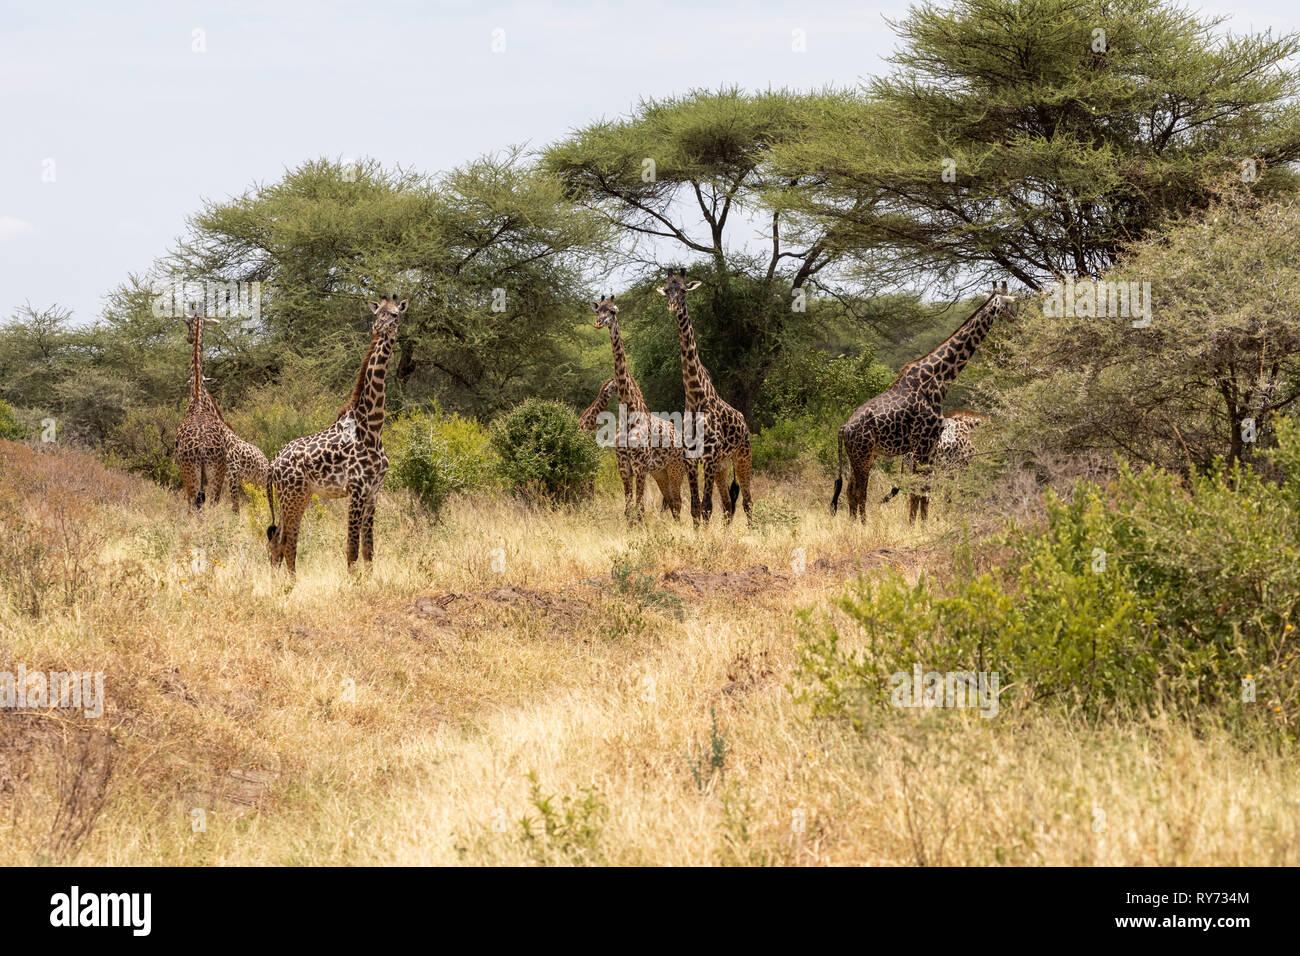 Masai Giraffe (Giraffa camelopardalis tippelskirchi) feeding in Lake Manyara National Park, Tanzania - Stock Image